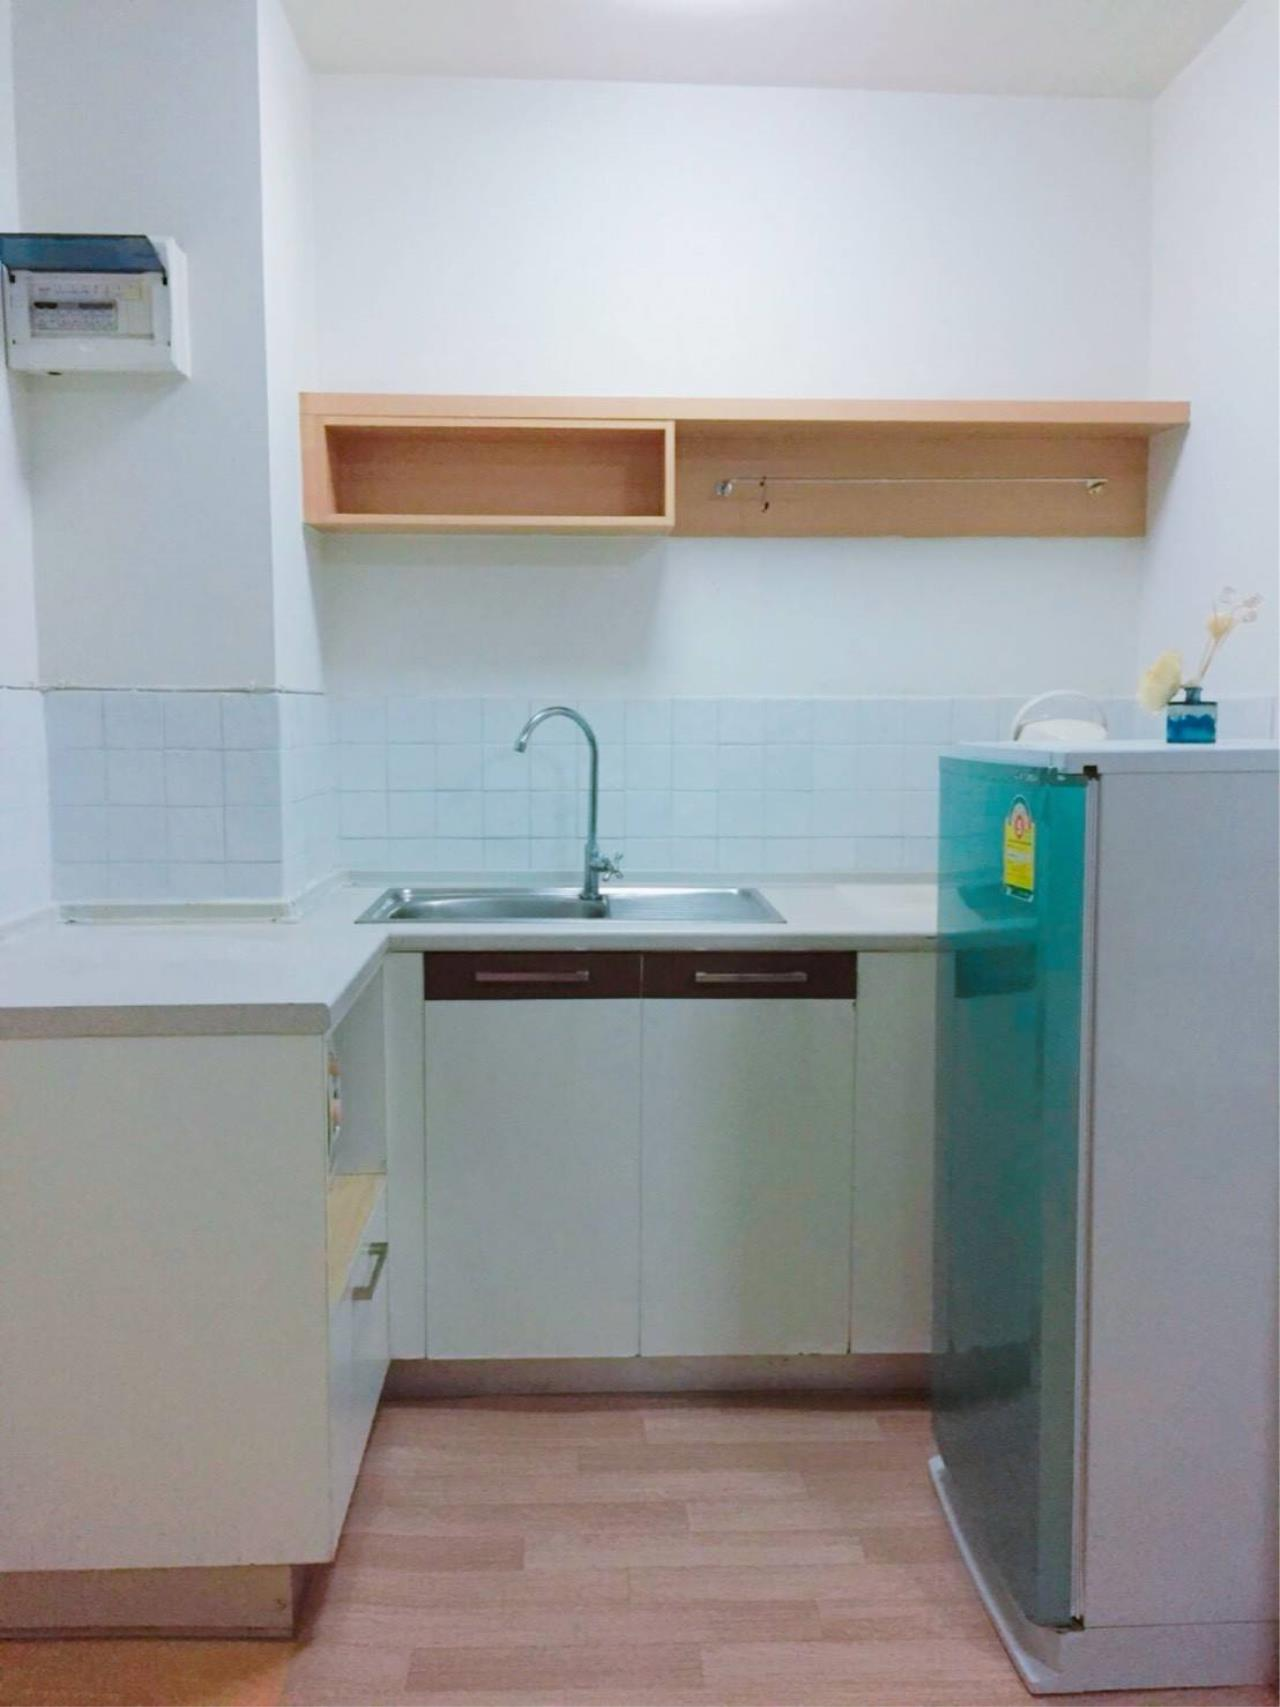 Quality Life Property Agency's R E N T ! My Condo Sukhumvit 52 | Studio 1 BATH | 25 SQ. M. 3